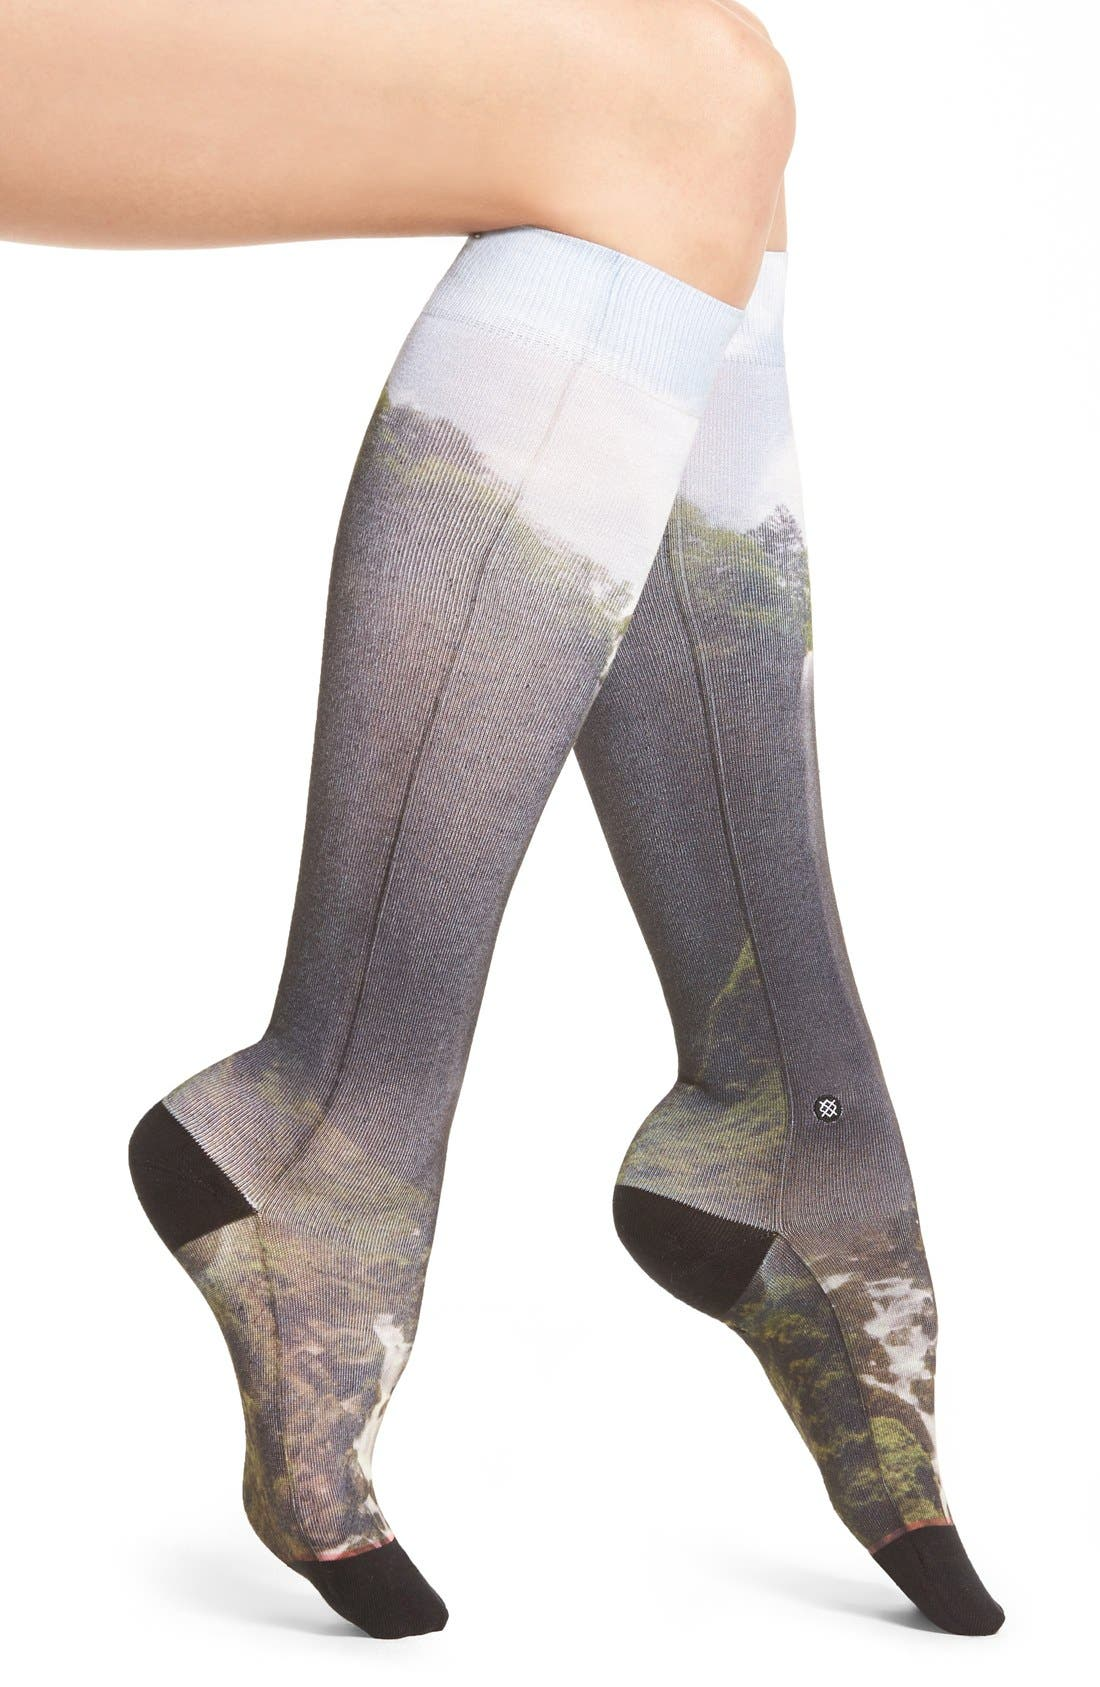 Main Image - Stance Earth Vs. Cosmo Knee Socks